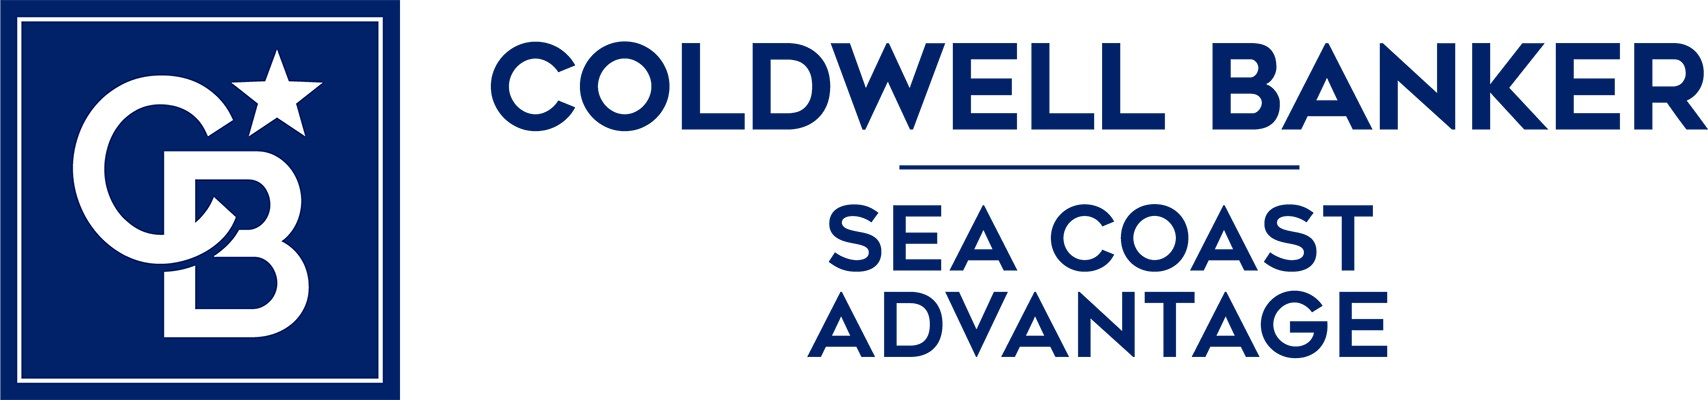 Carol Averitte - Coldwell Banker Sea Coast Advantage Realty Logo